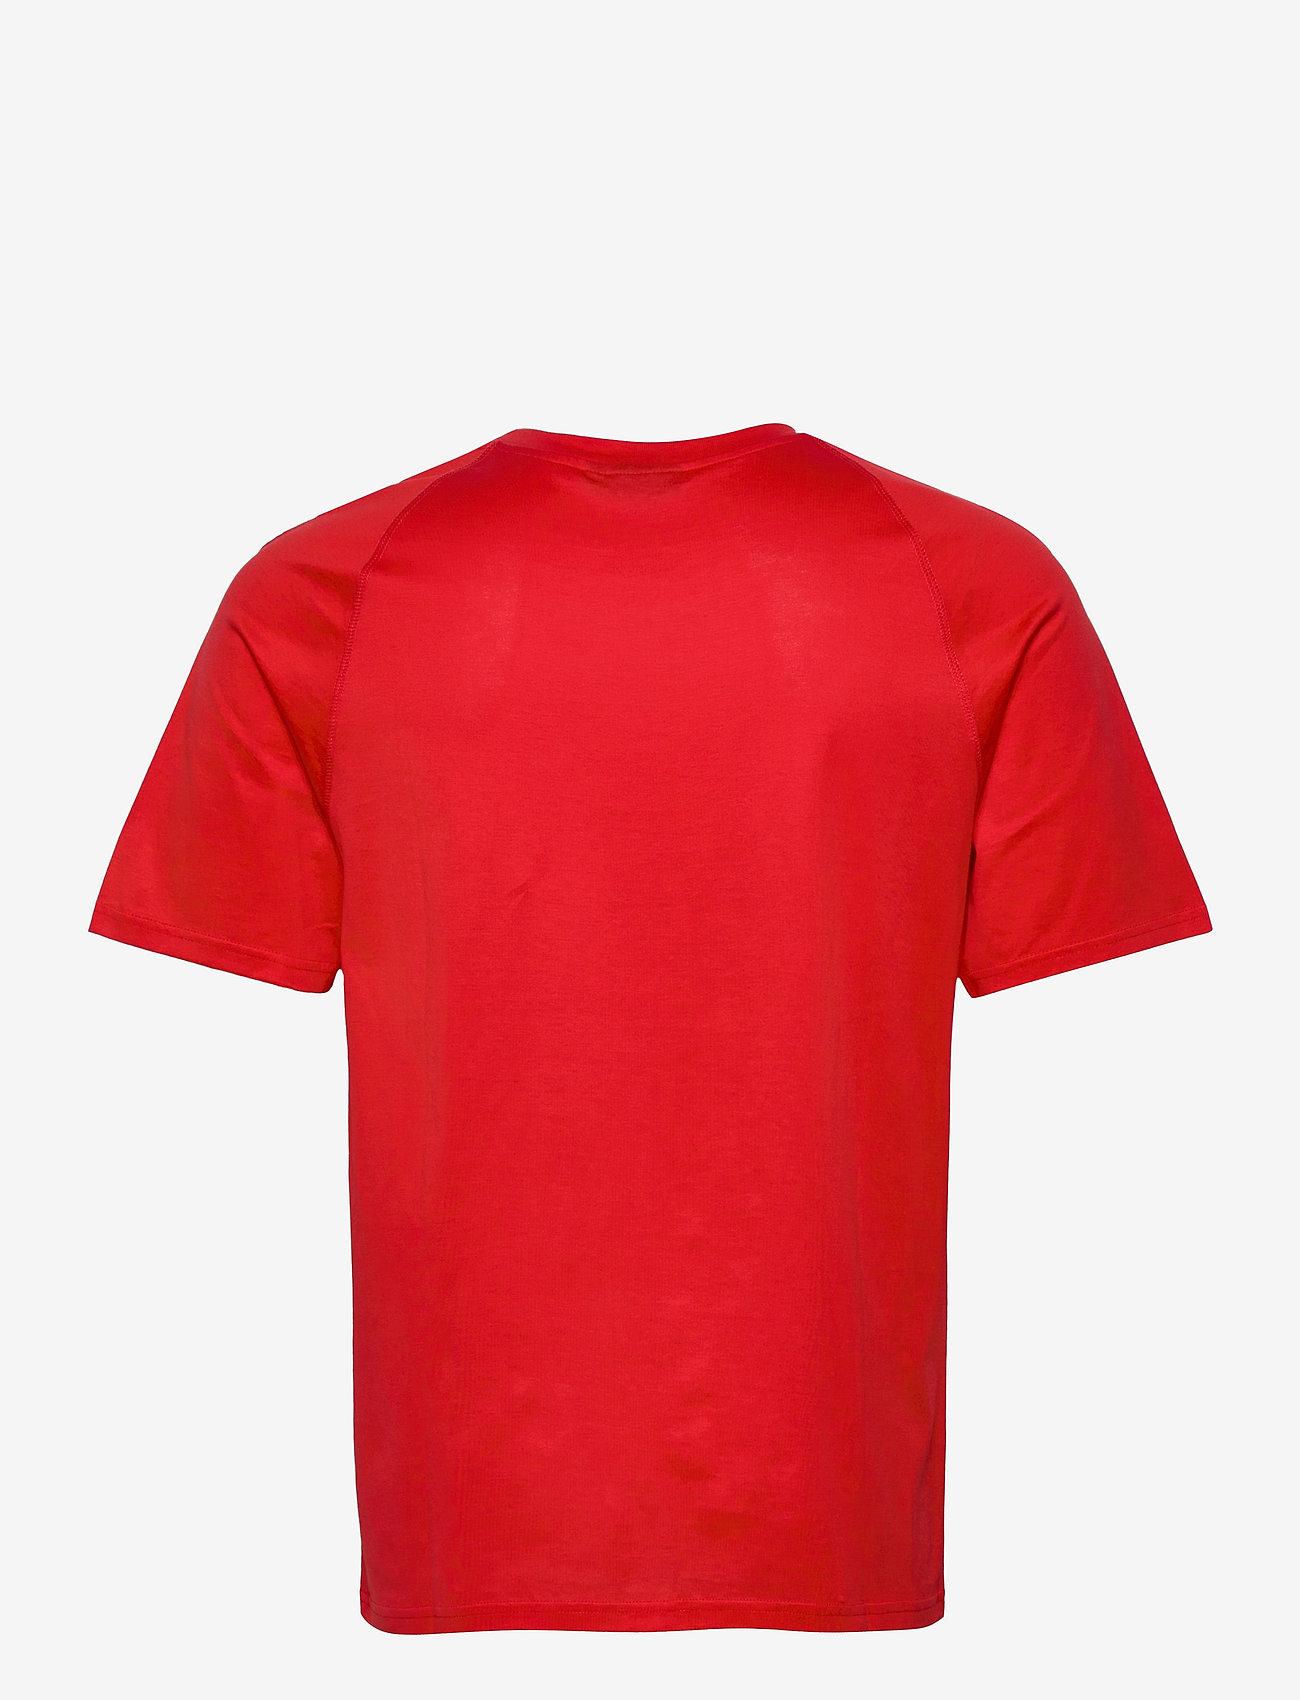 J. Lindeberg - Jordan Bridge t-shirt cotton - basic t-shirts - racing red - 1